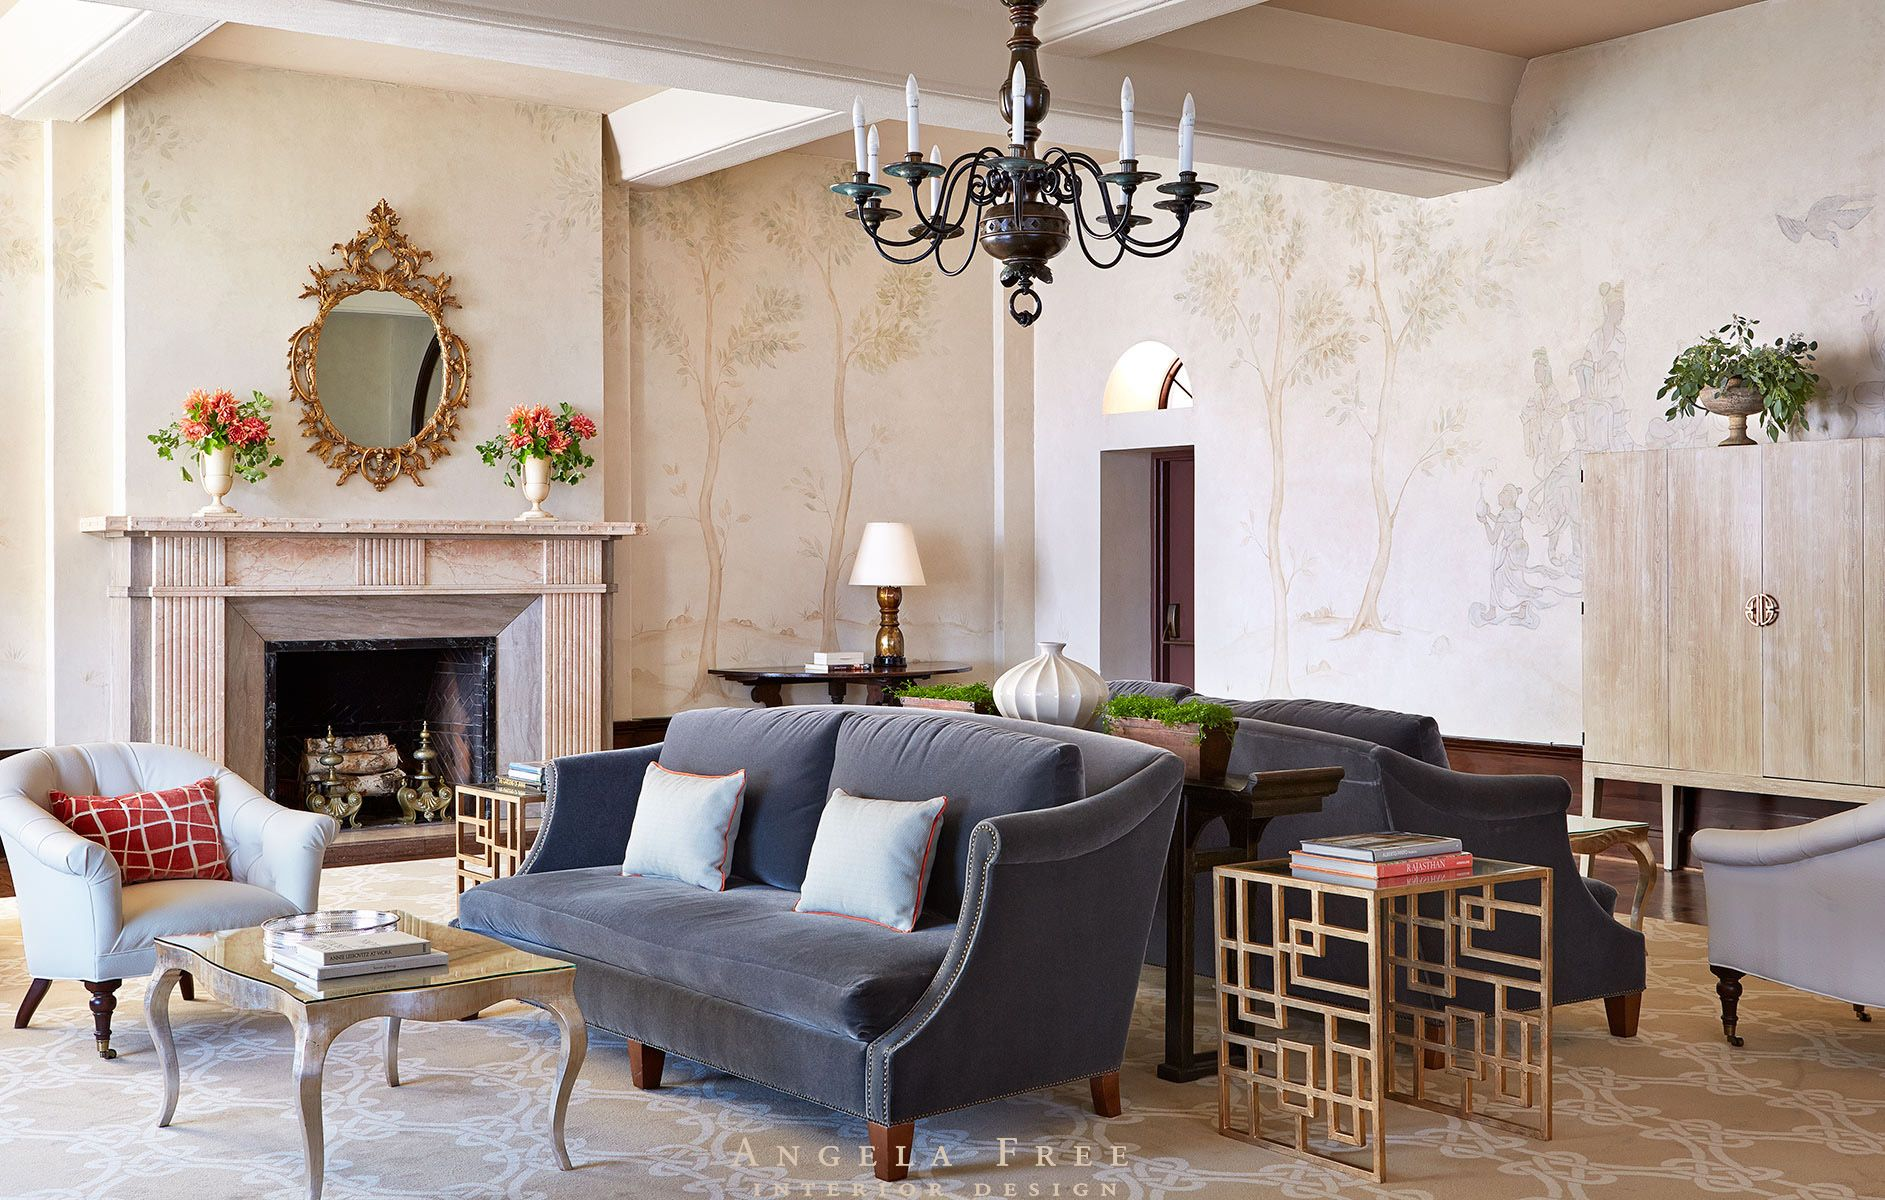 Angela Free Design / Julia Morgan YWCA